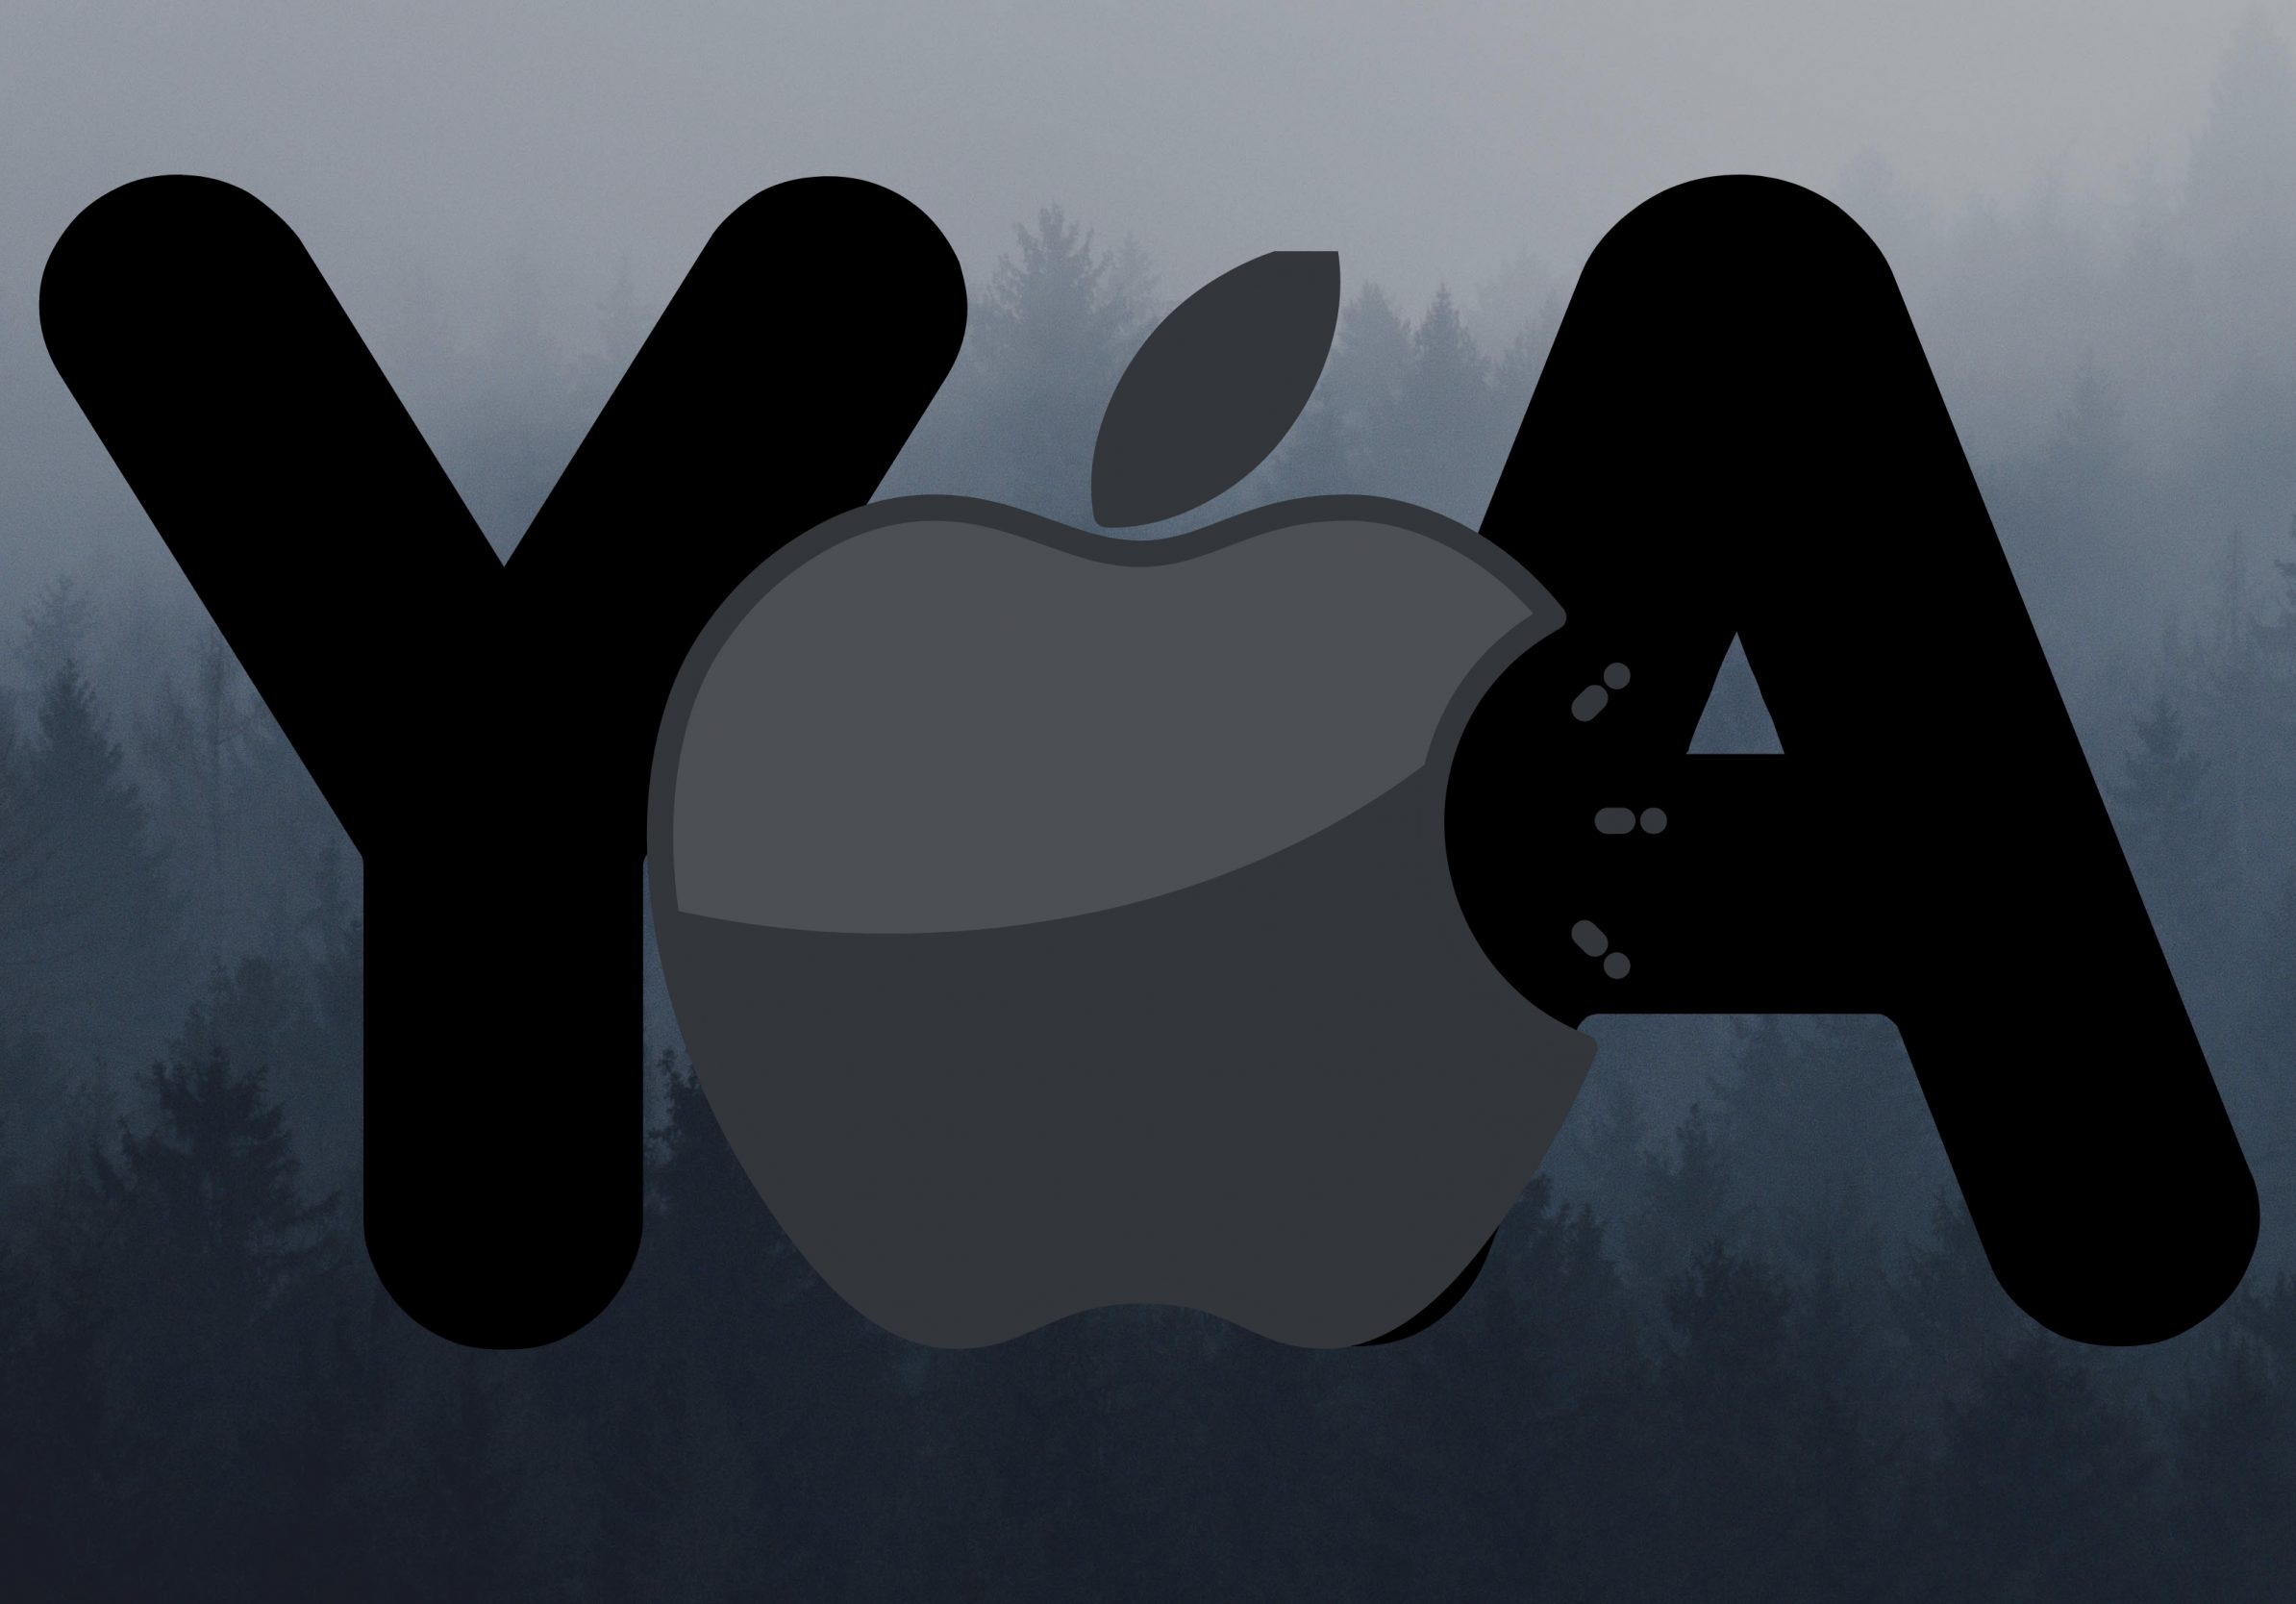 2388x1668 iPad Pro wallpapers Apple Logo Ya Grey Background iPad Wallpaper 2388x1668 pixels resolution